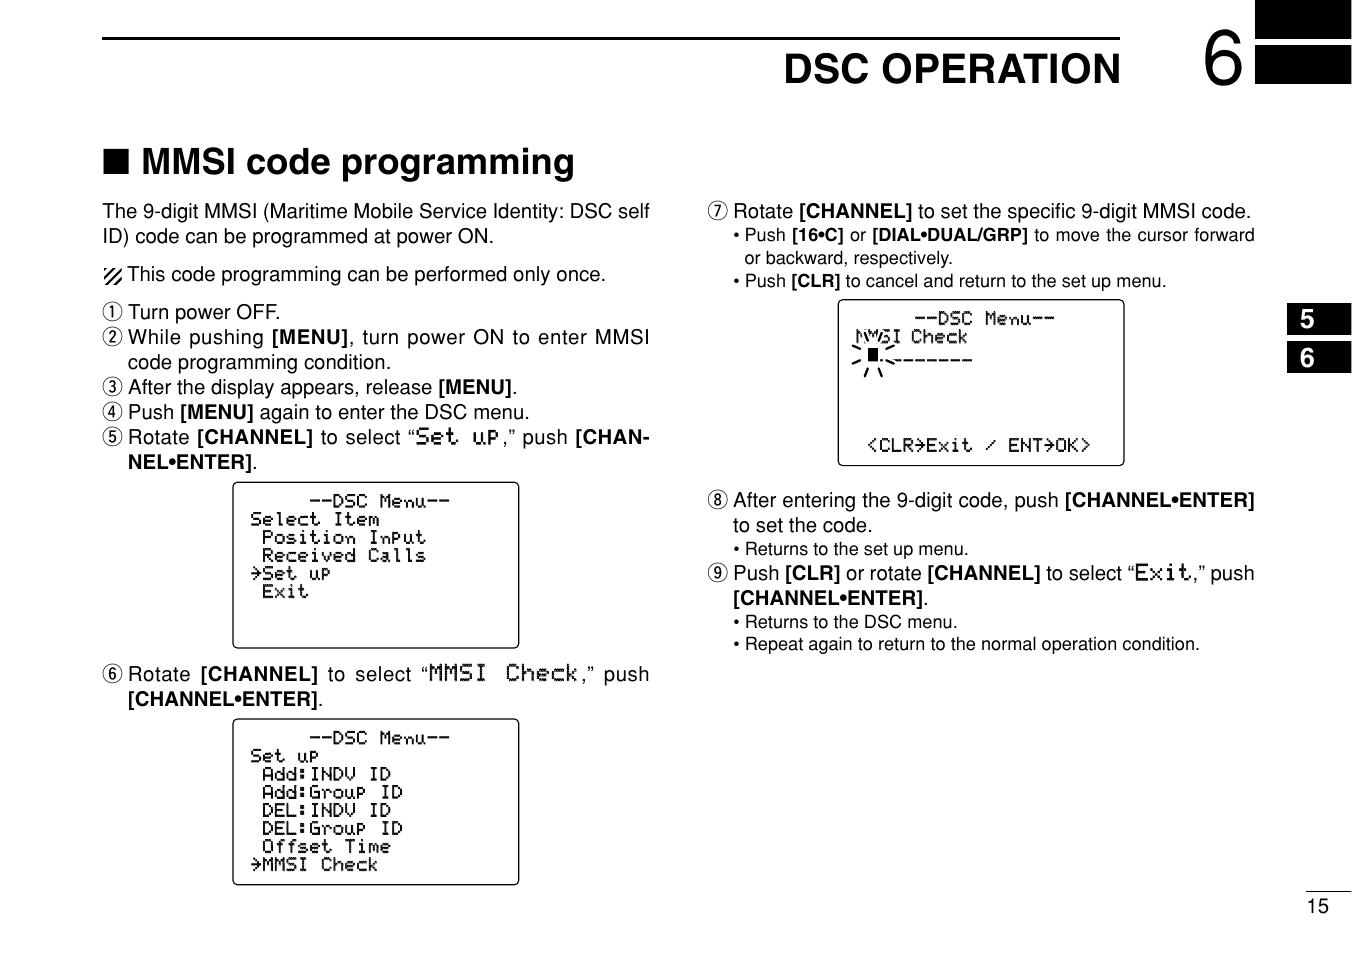 dsc operation mmsi code programming icom ic m505 user manual rh manualsdir com icom ic-m505 instruction manual Pro M505 Mechanical Pencil